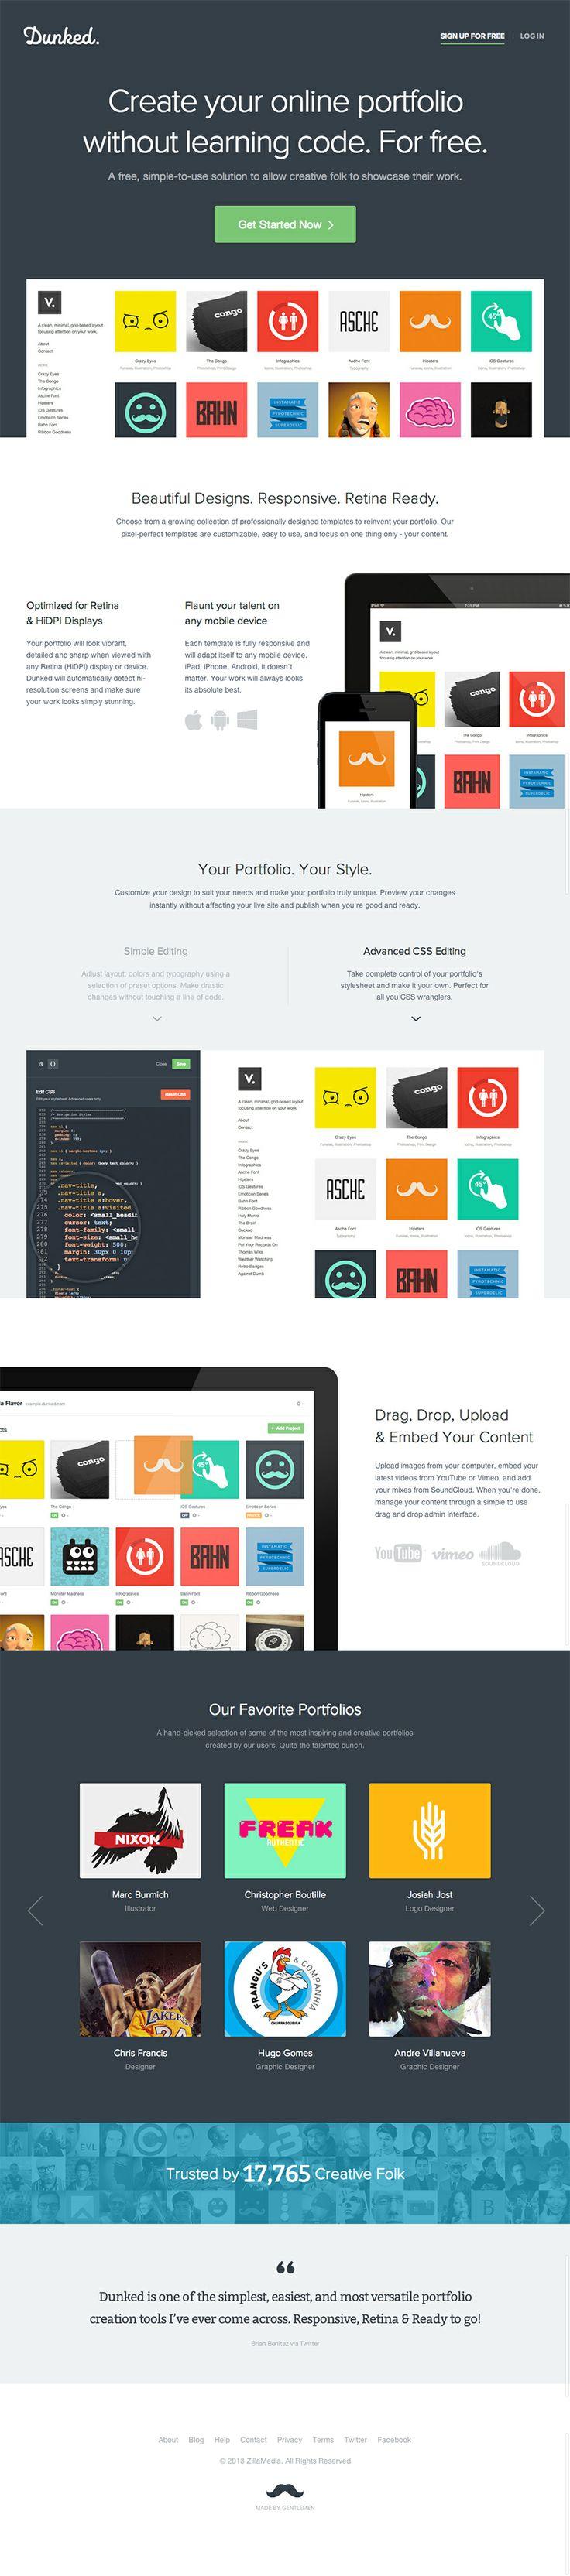 479 best Flat Design Inspiration images on Pinterest   Web layout ...